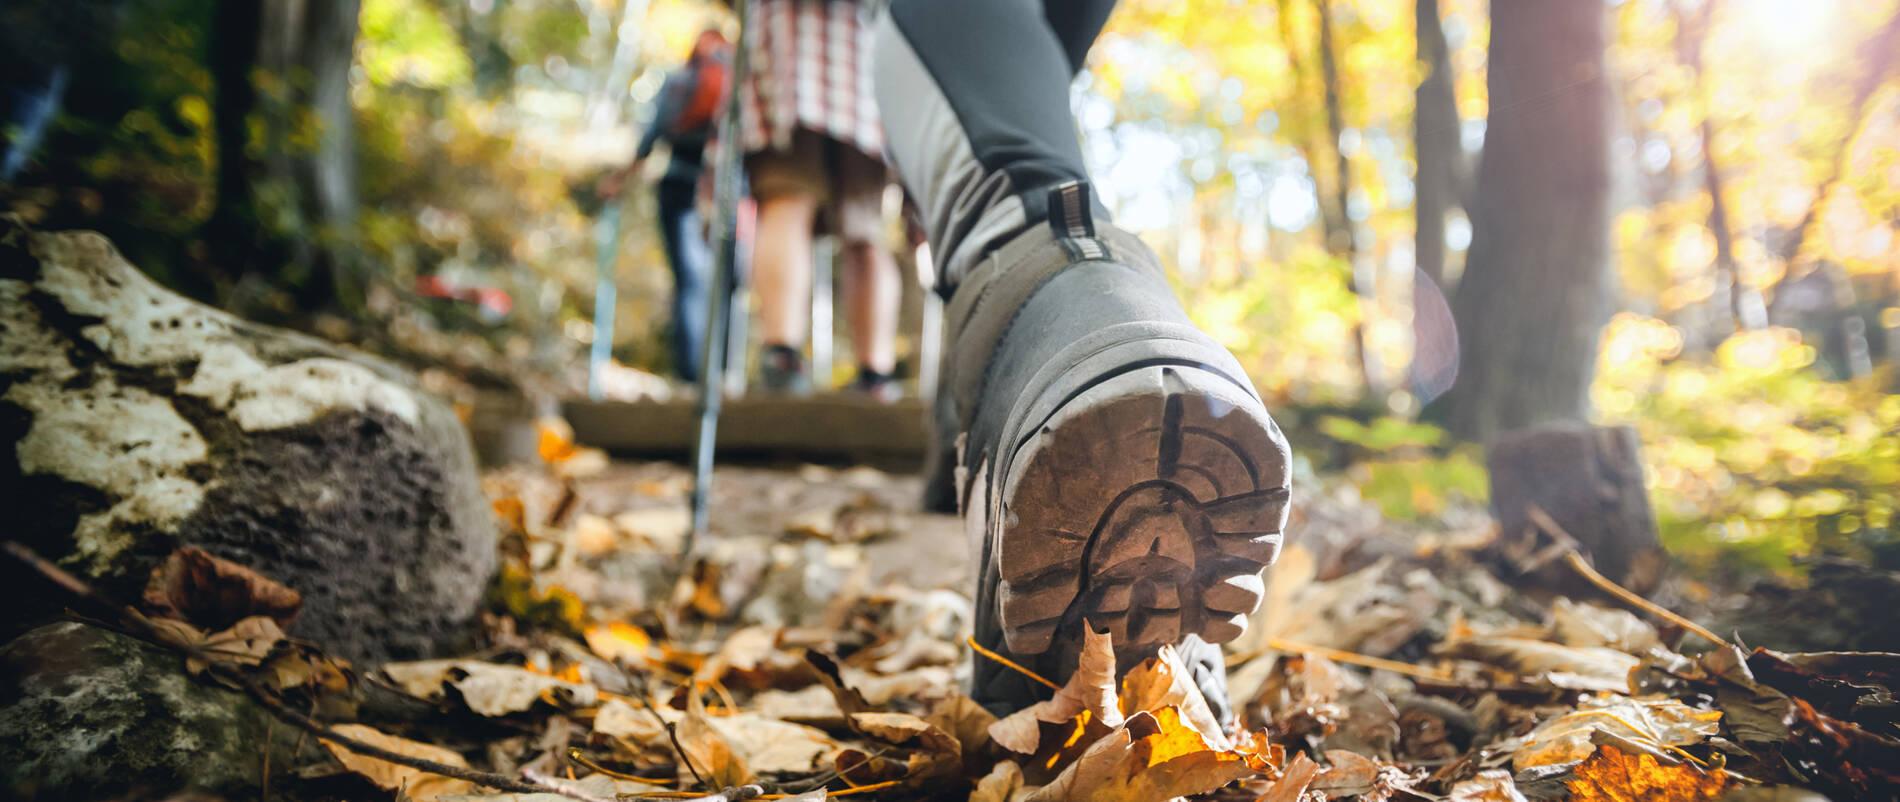 Hiker woman with trekking sticks climbs steep on mountain trail, focus on boot.